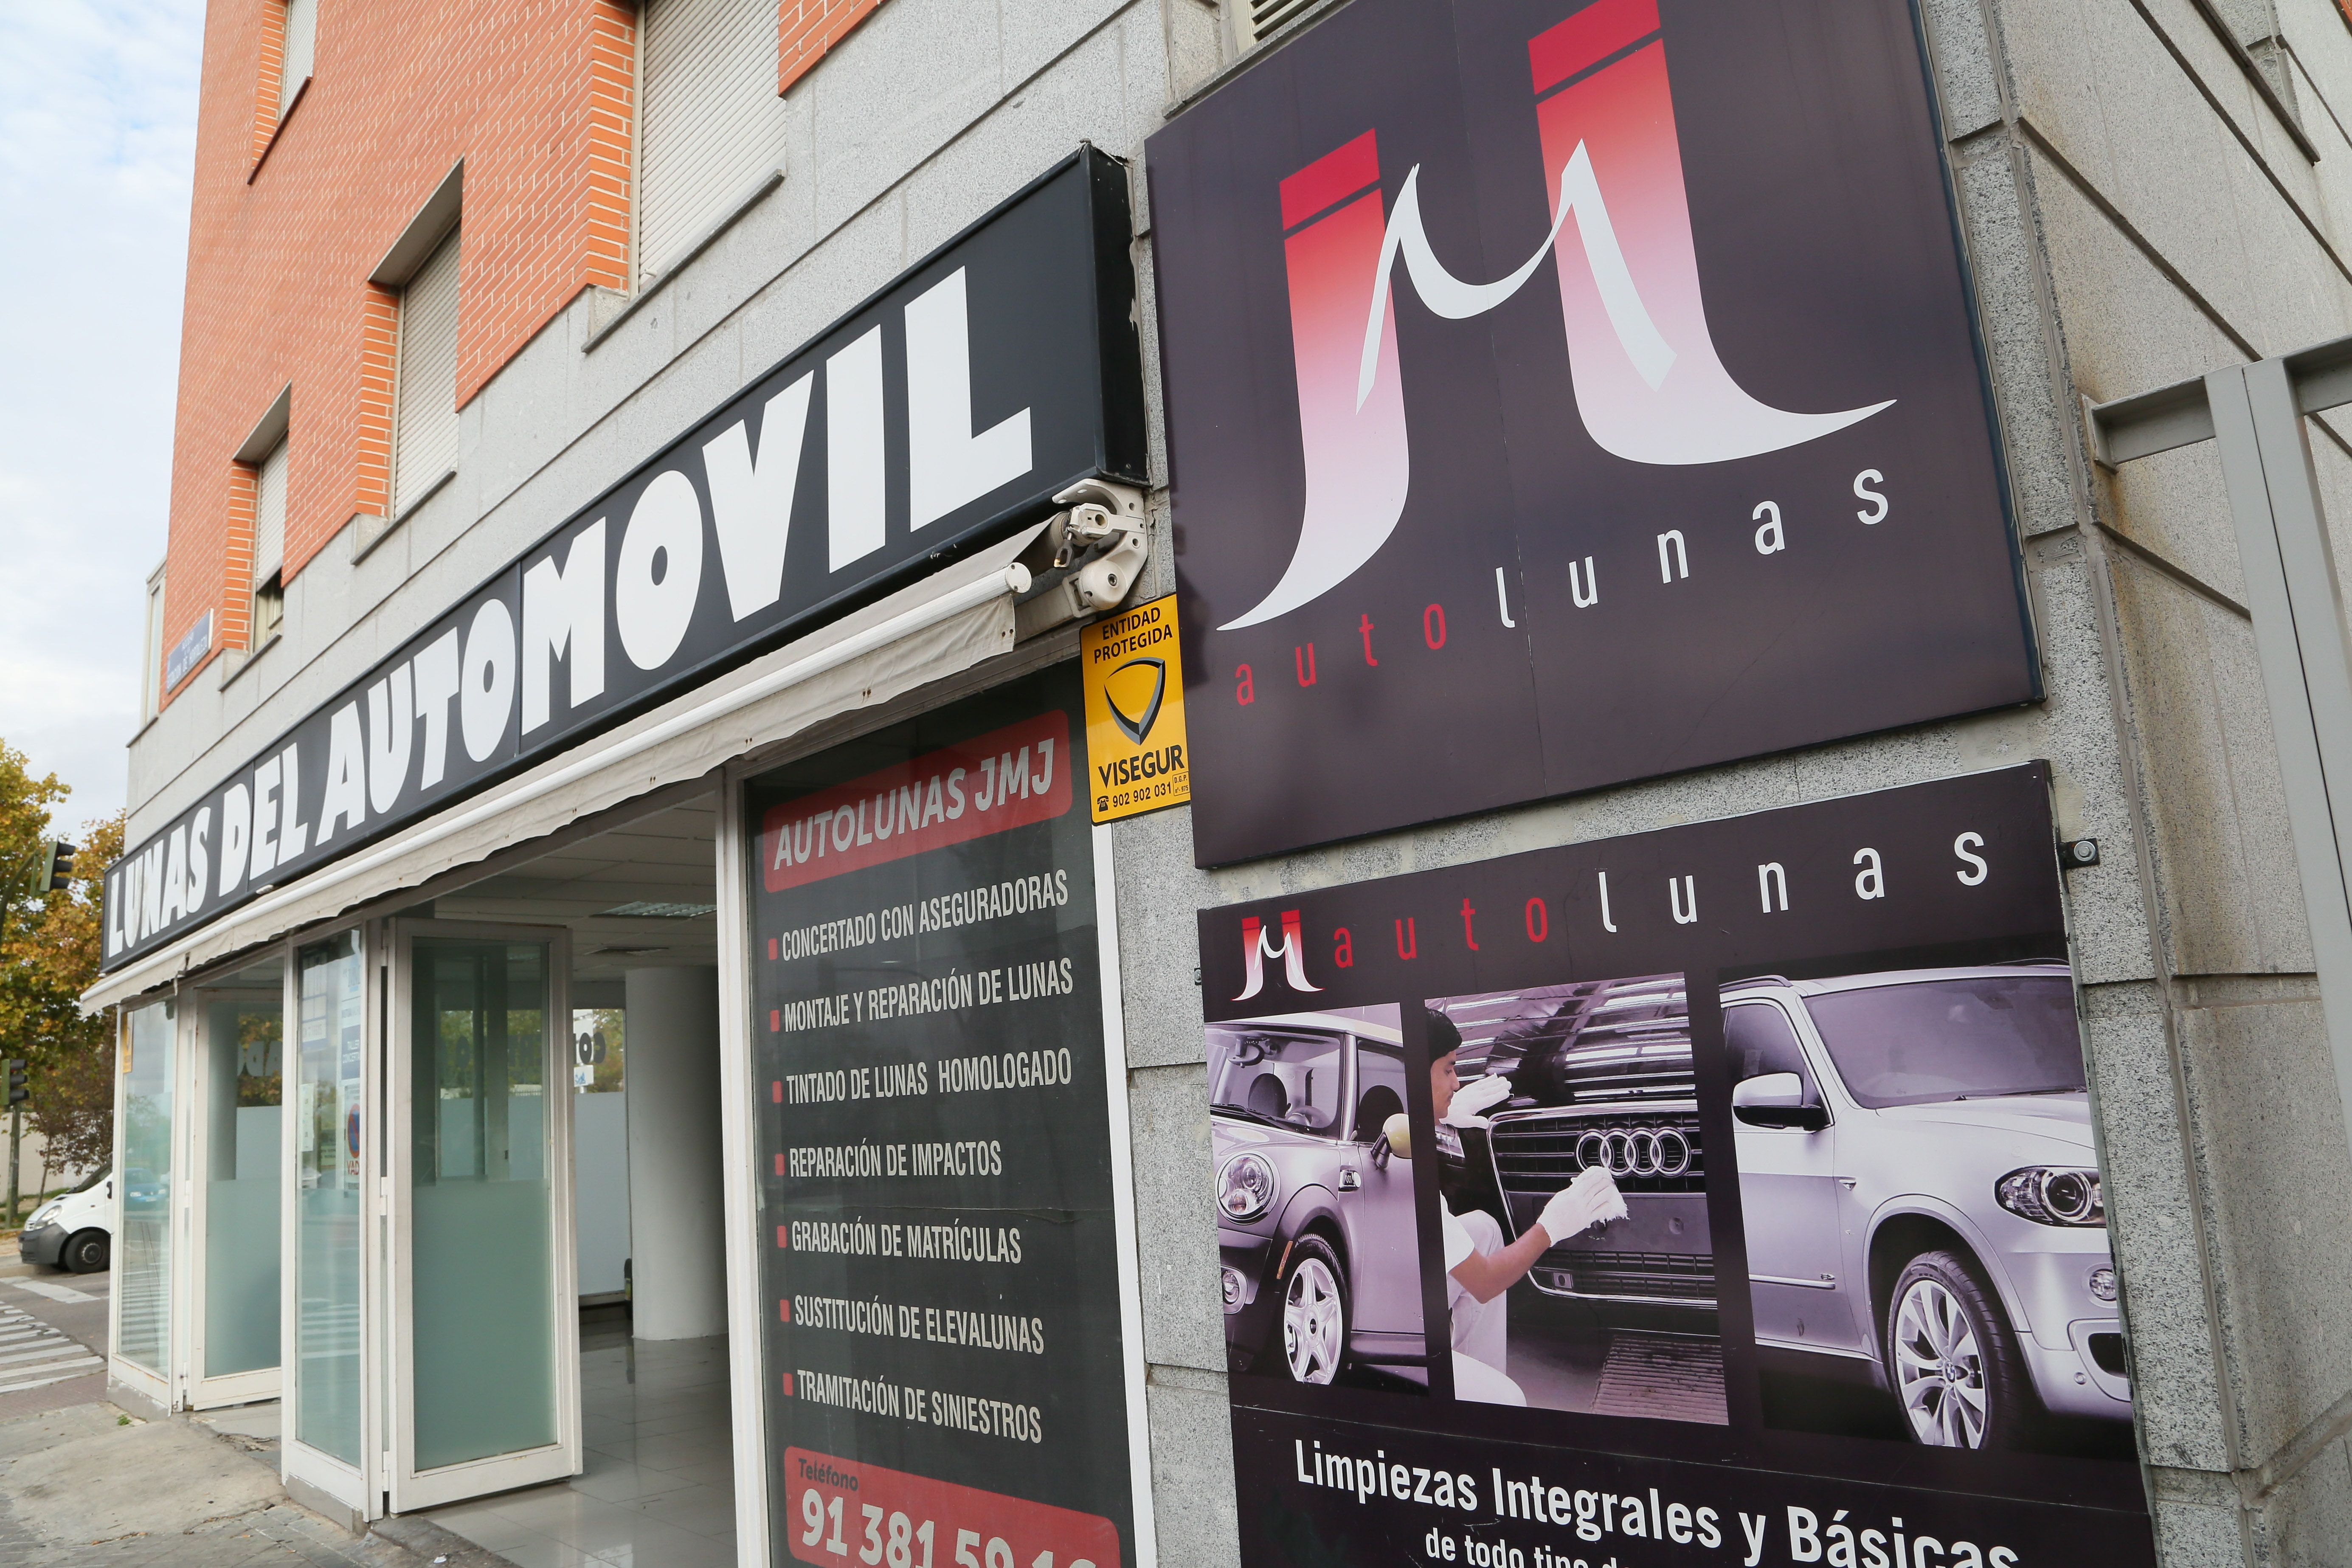 Foto 1 de Lunas de automóviles en Madrid | Autolunas J.M.J.